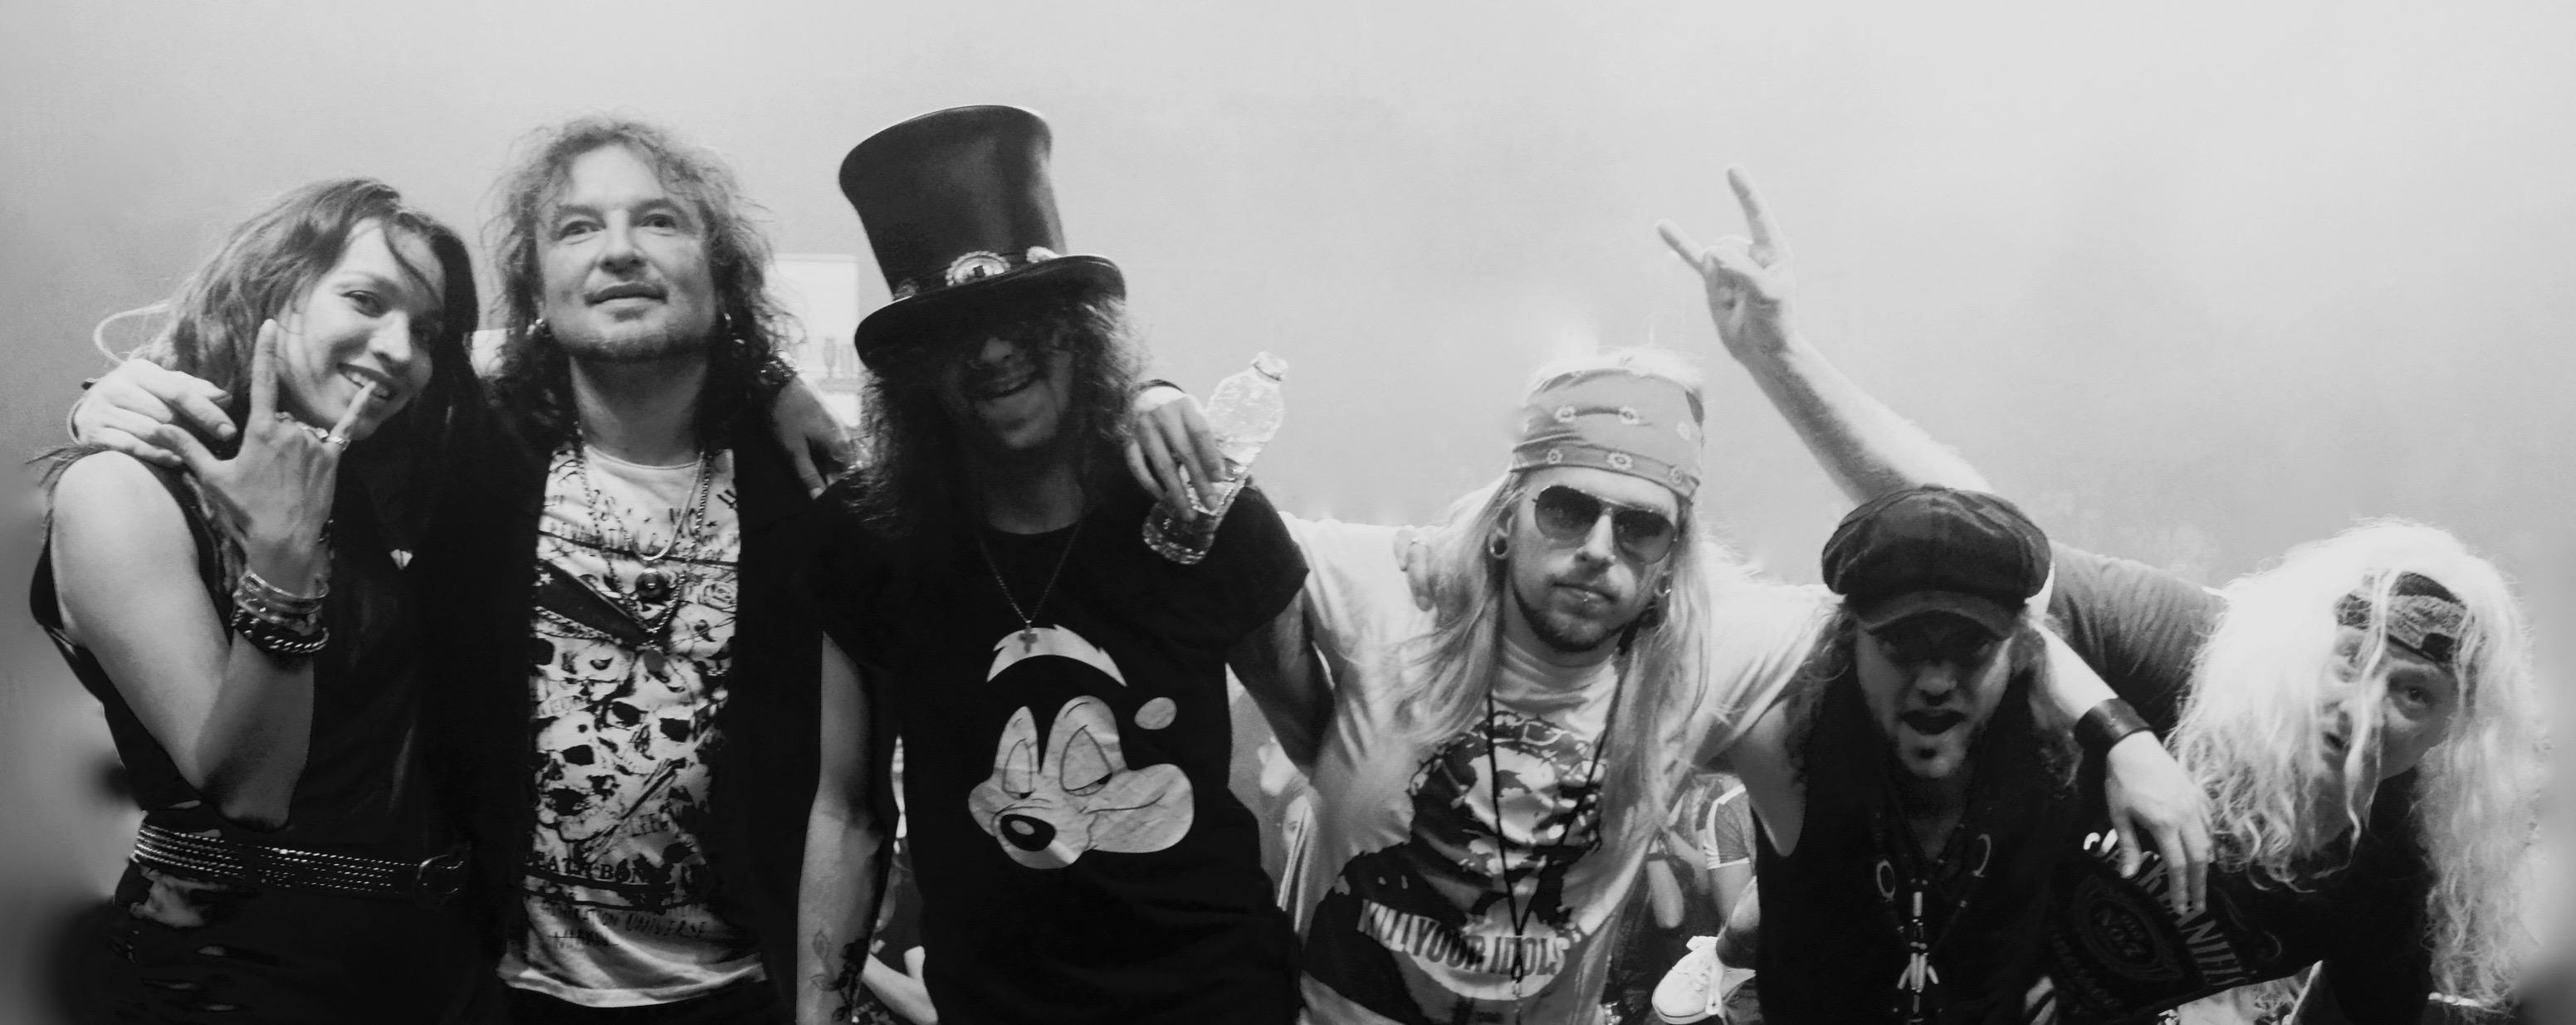 The-Ultimate-Guns-n-Roses.jpg